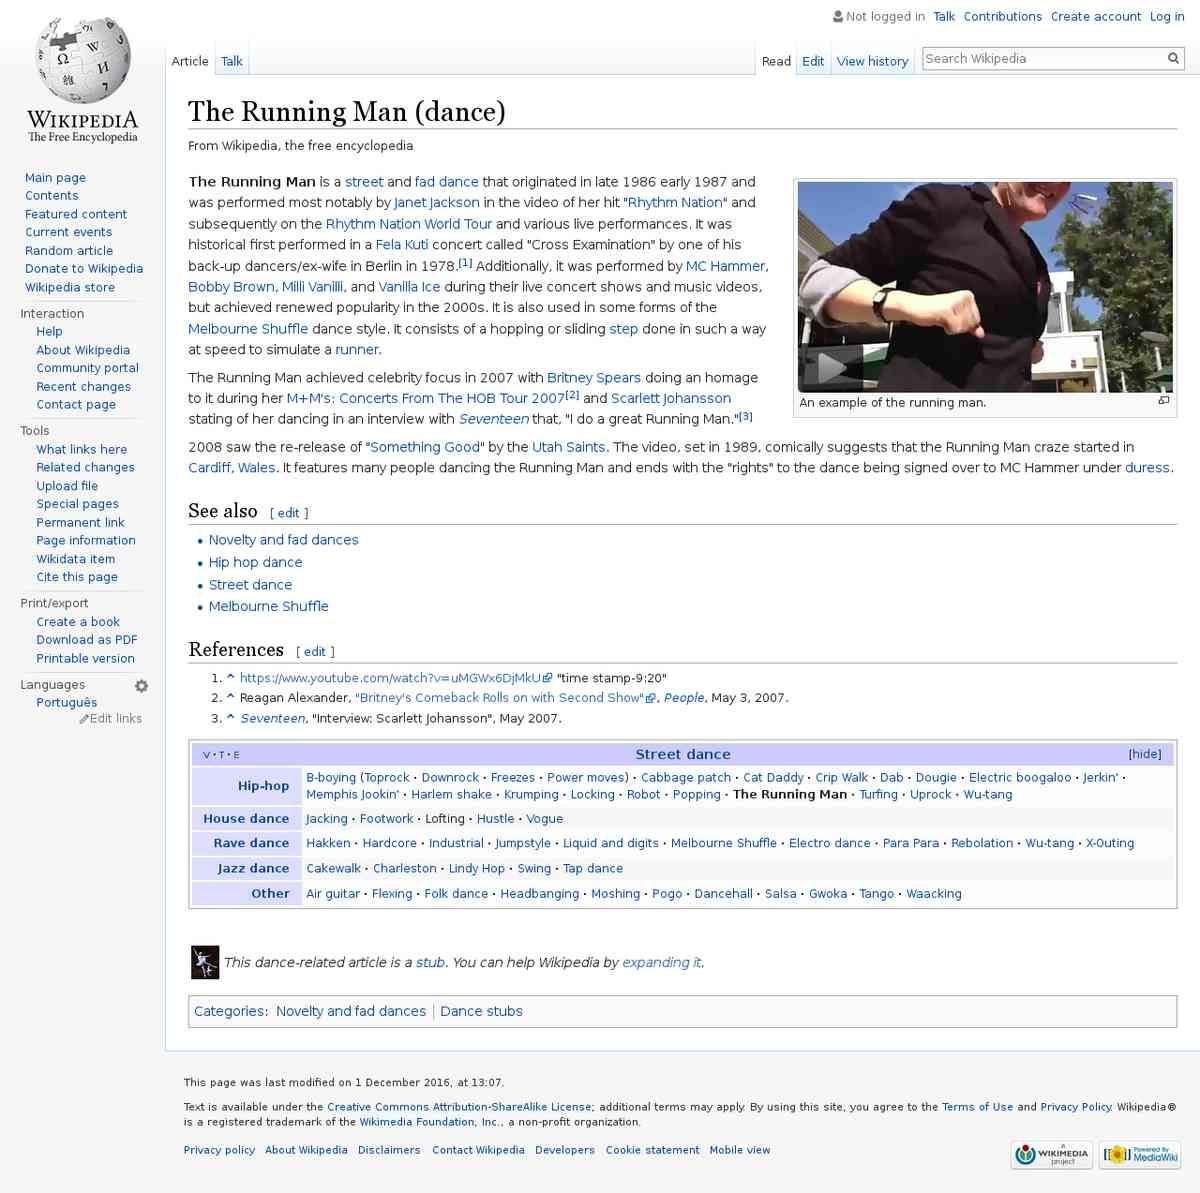 The Running Man (dance) - Wikipedia